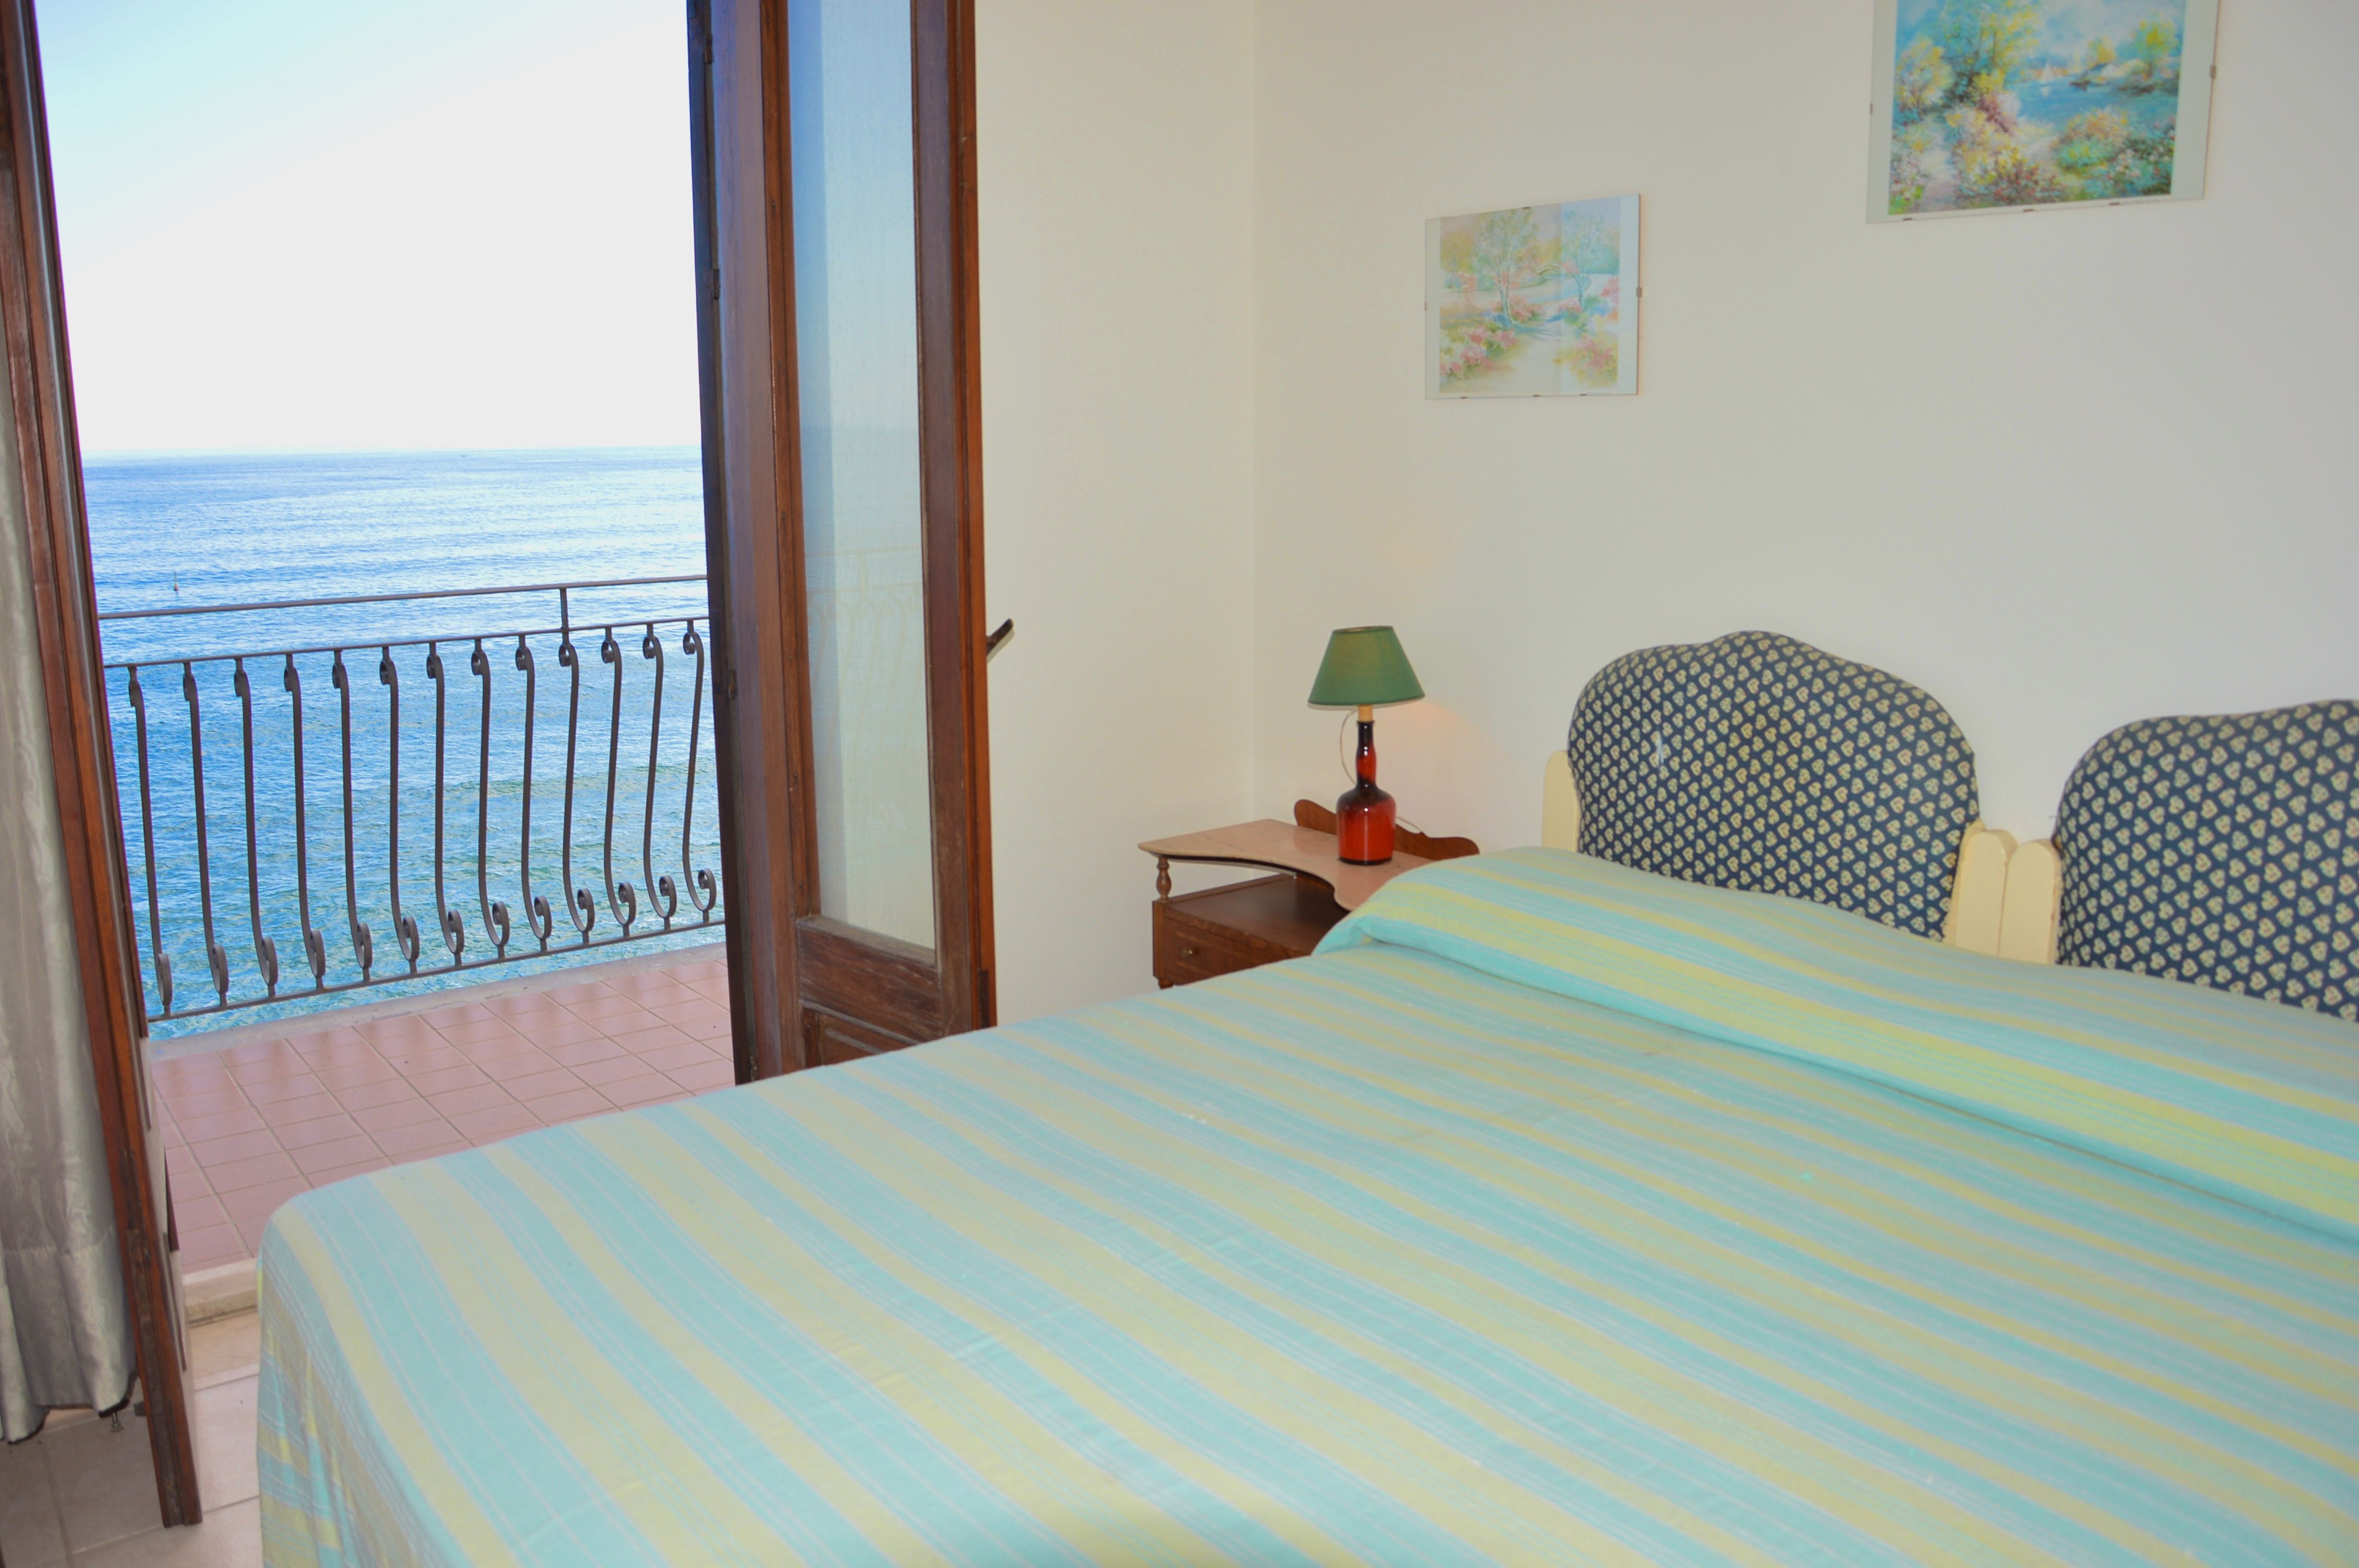 Holiday apartment Casa Camelia - Apartment in front of the beach in Giardini Naxos (1976978), Giardini Naxos, Messina, Sicily, Italy, picture 3